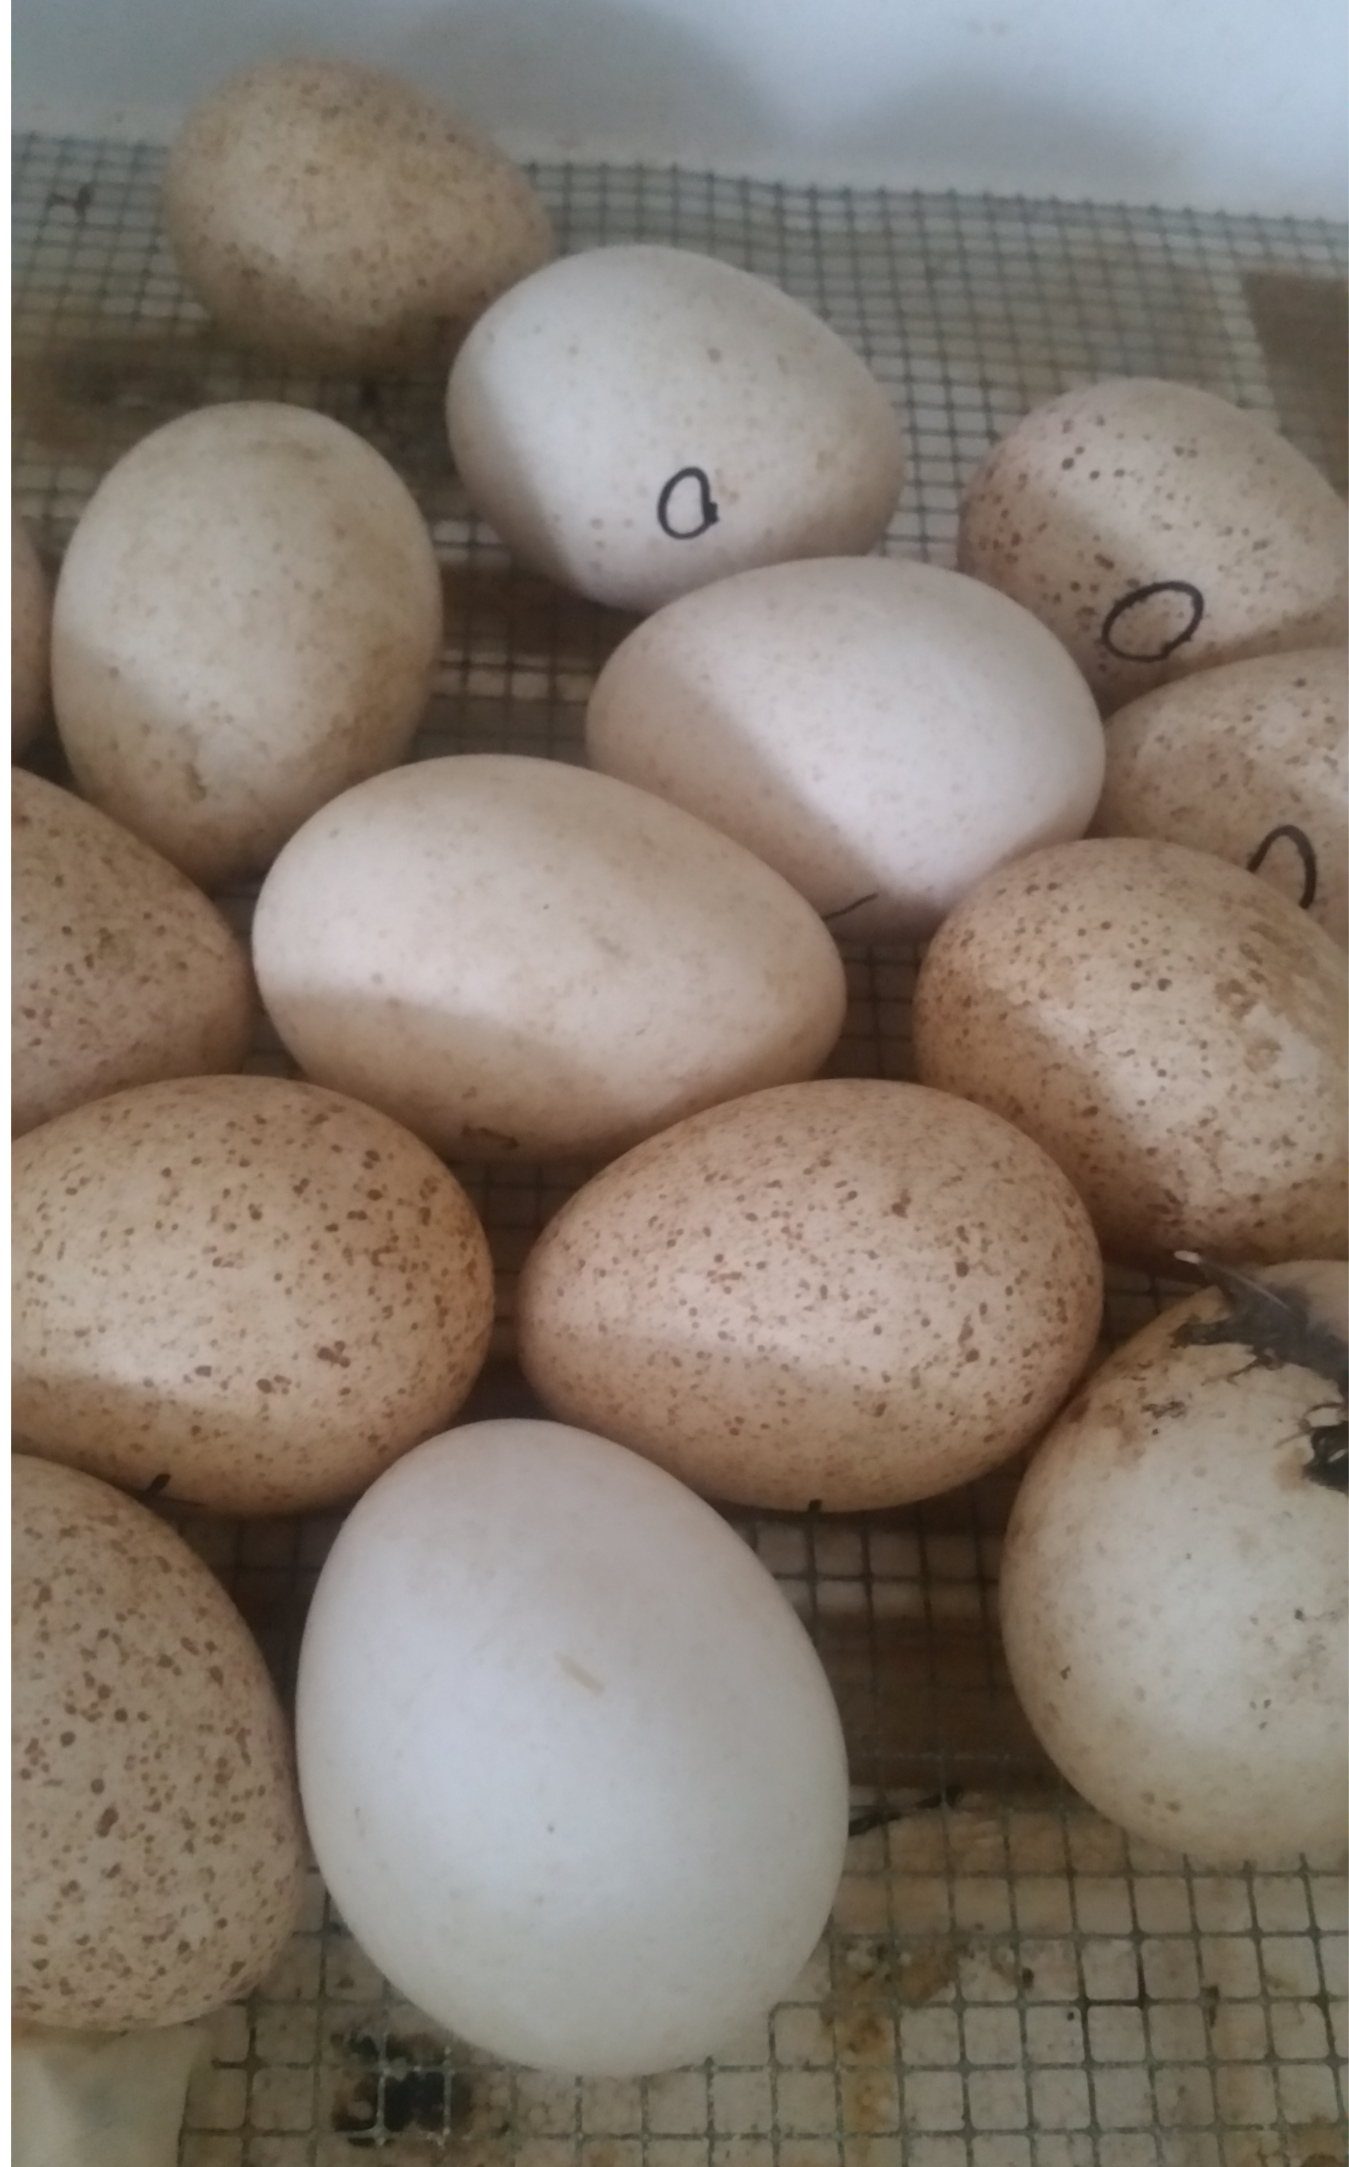 Turkey Egg Rescue